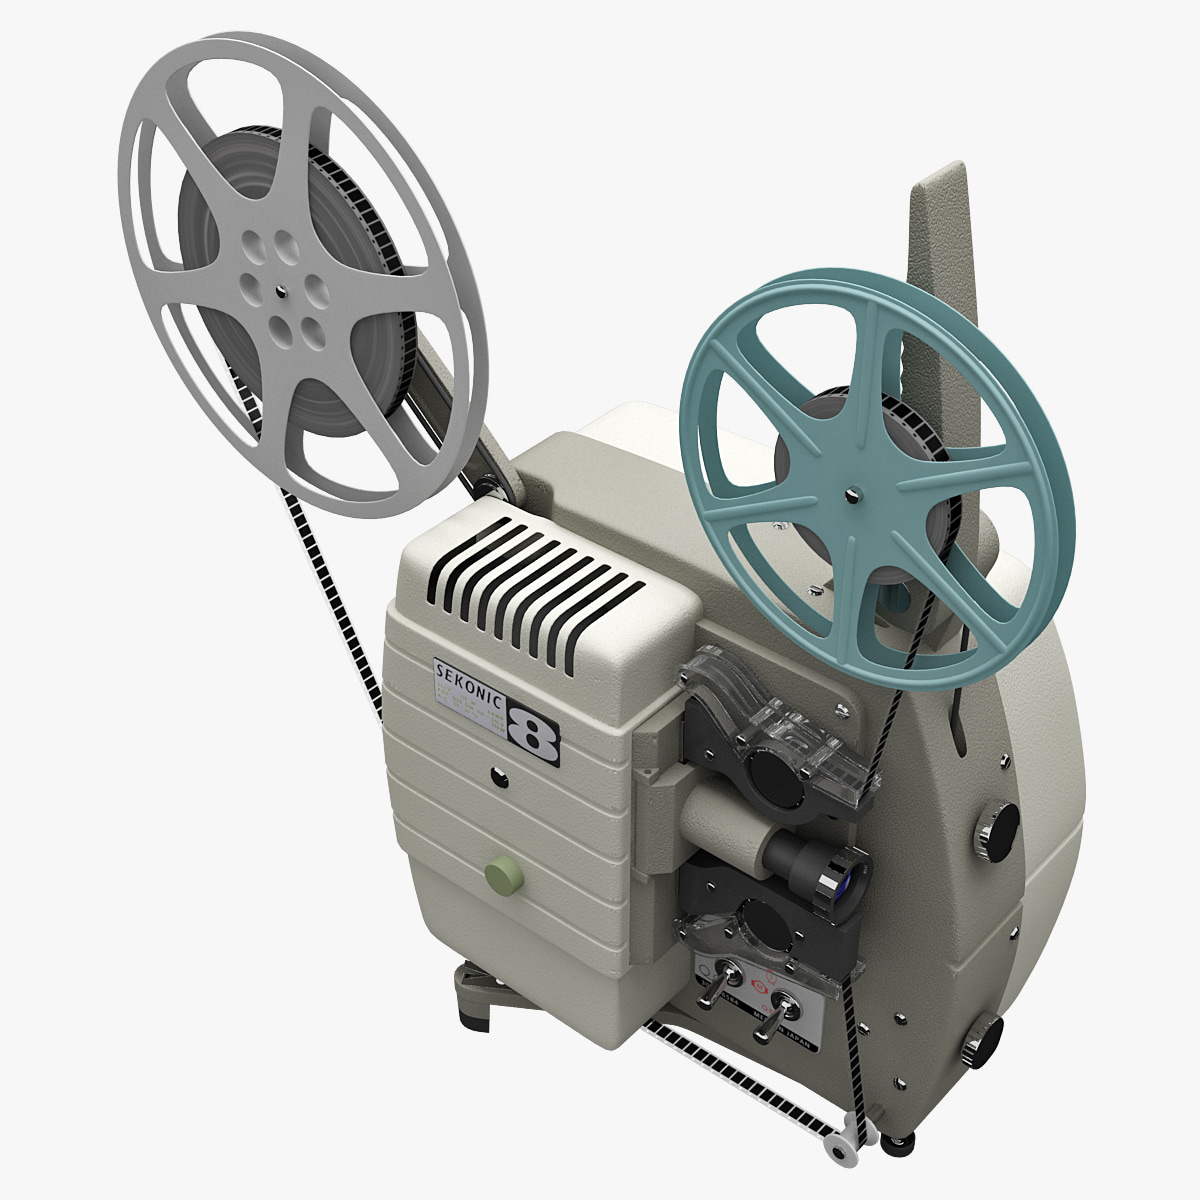 Vintage_Projector_Sekonic_Model_30C_8mm_0001_2.jpg